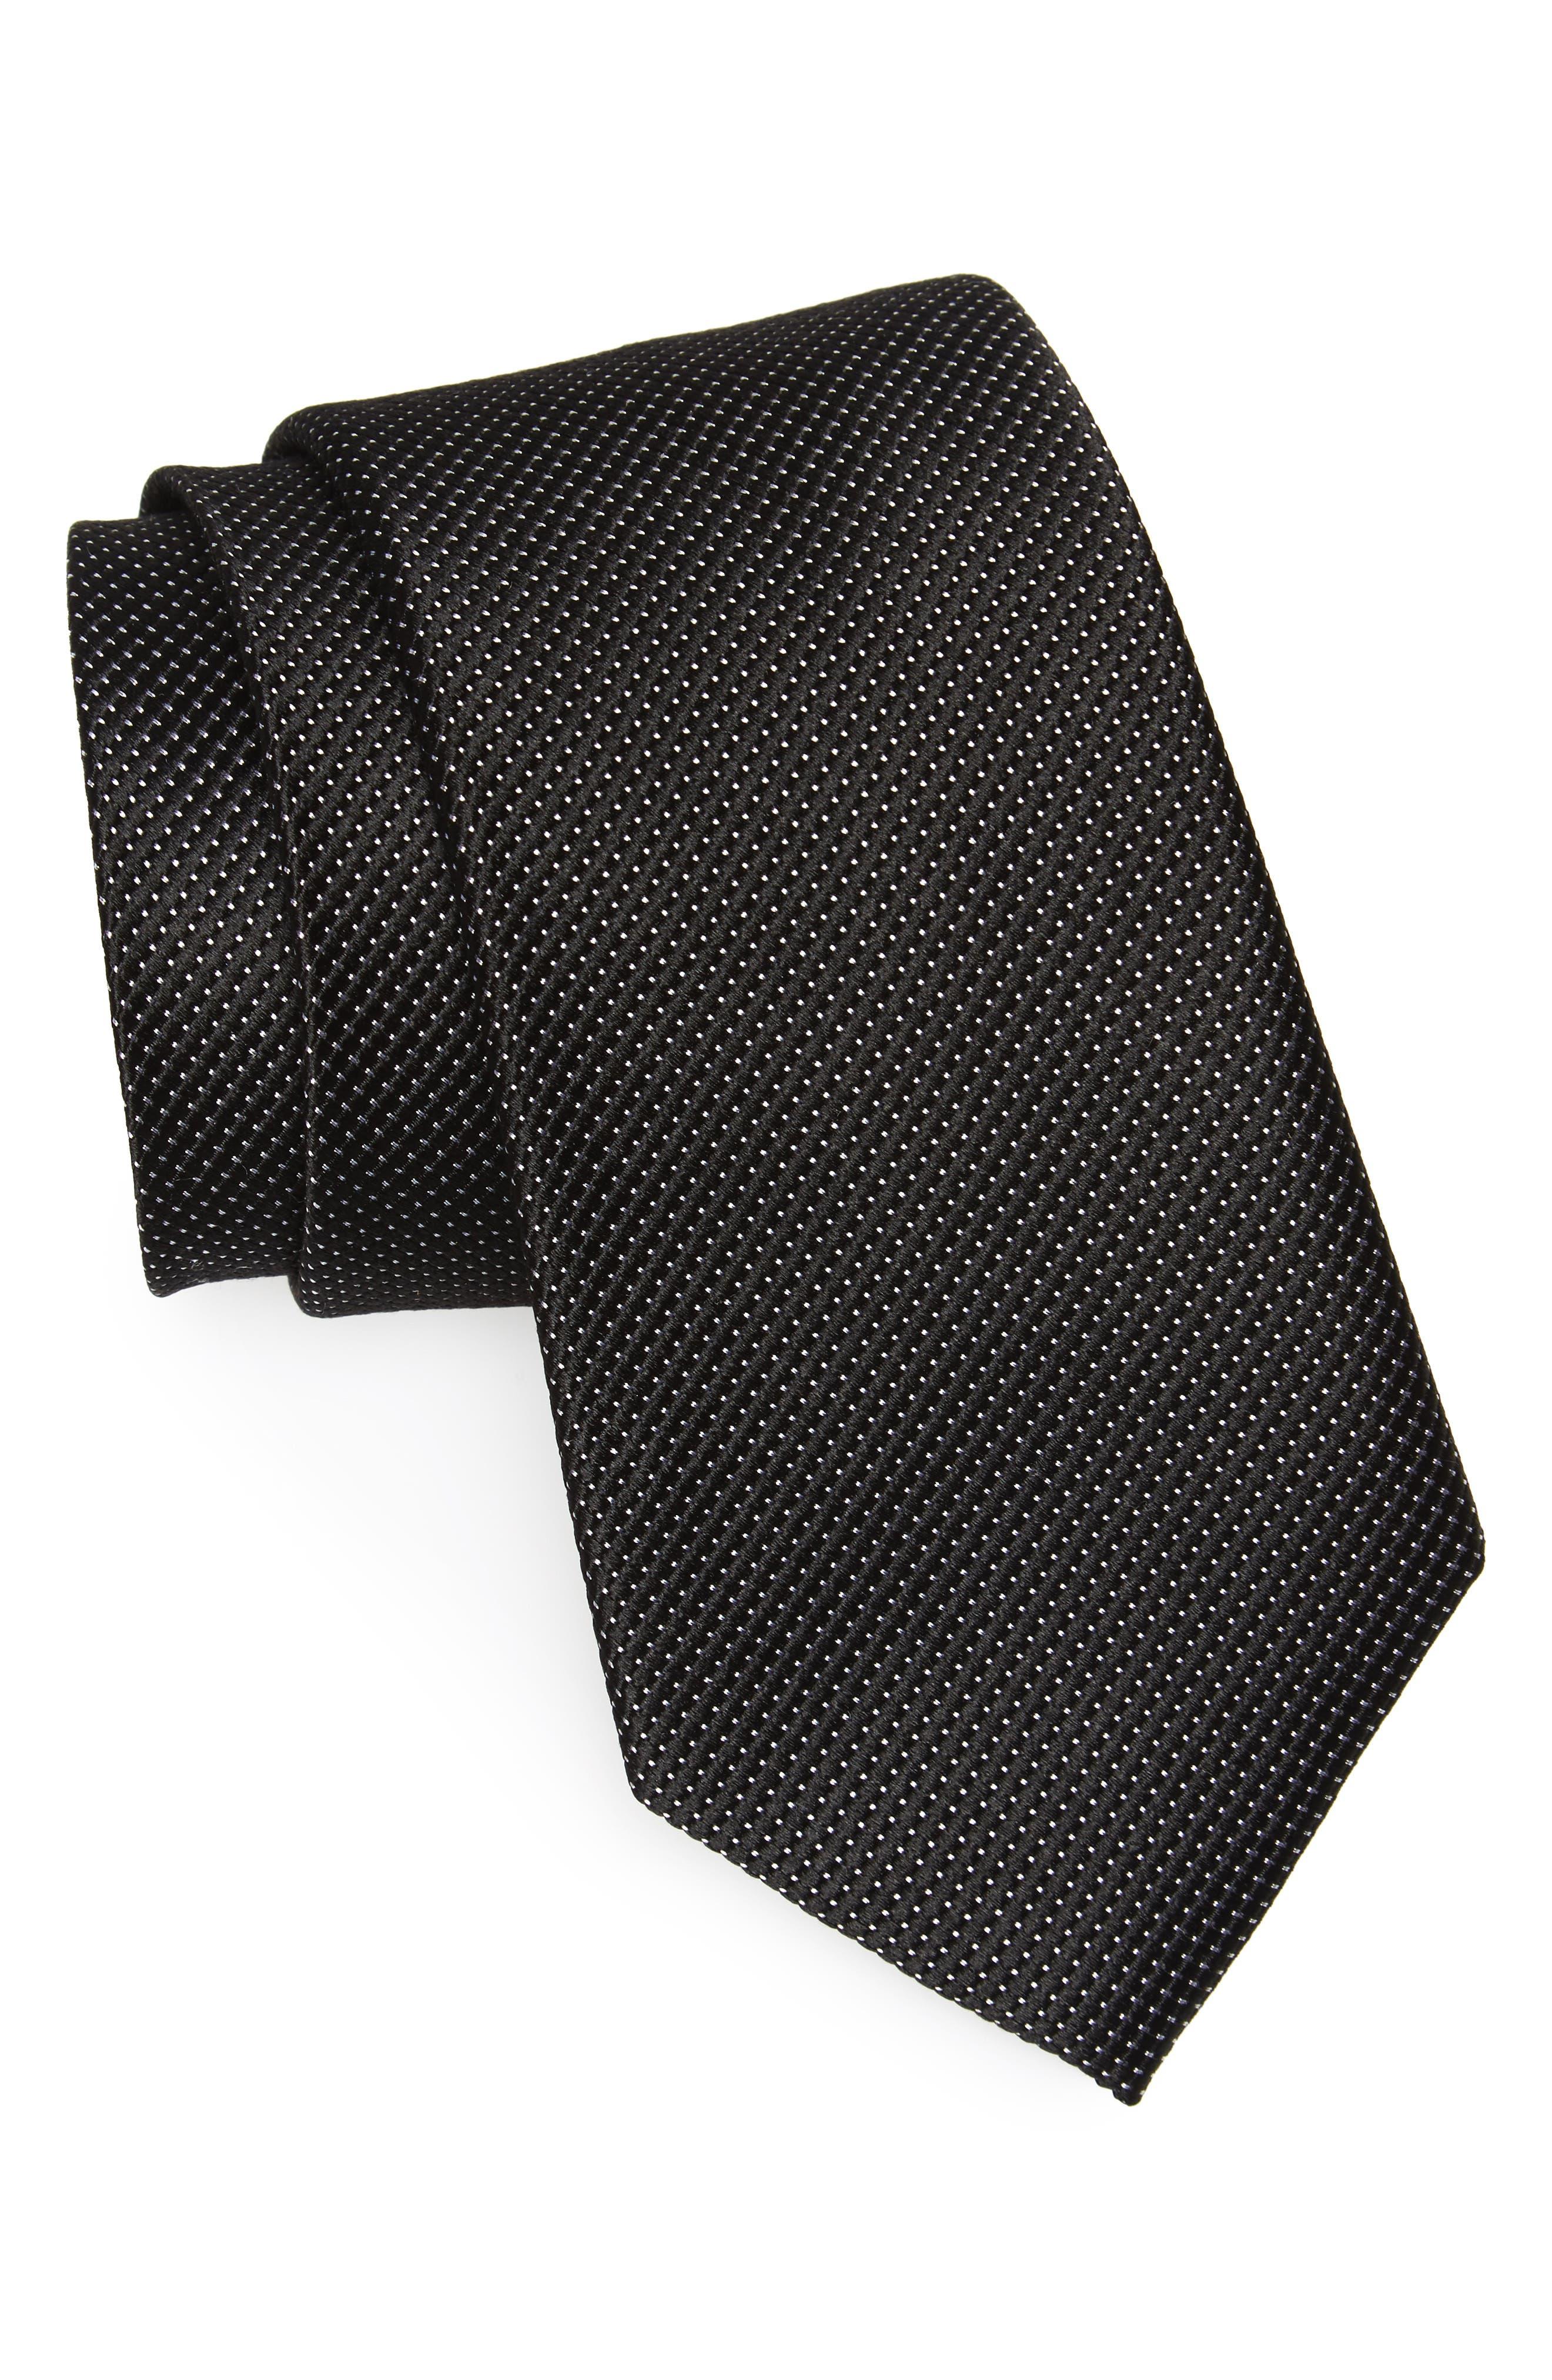 Vendôme Dot Silk Tie,                         Main,                         color, BLACK